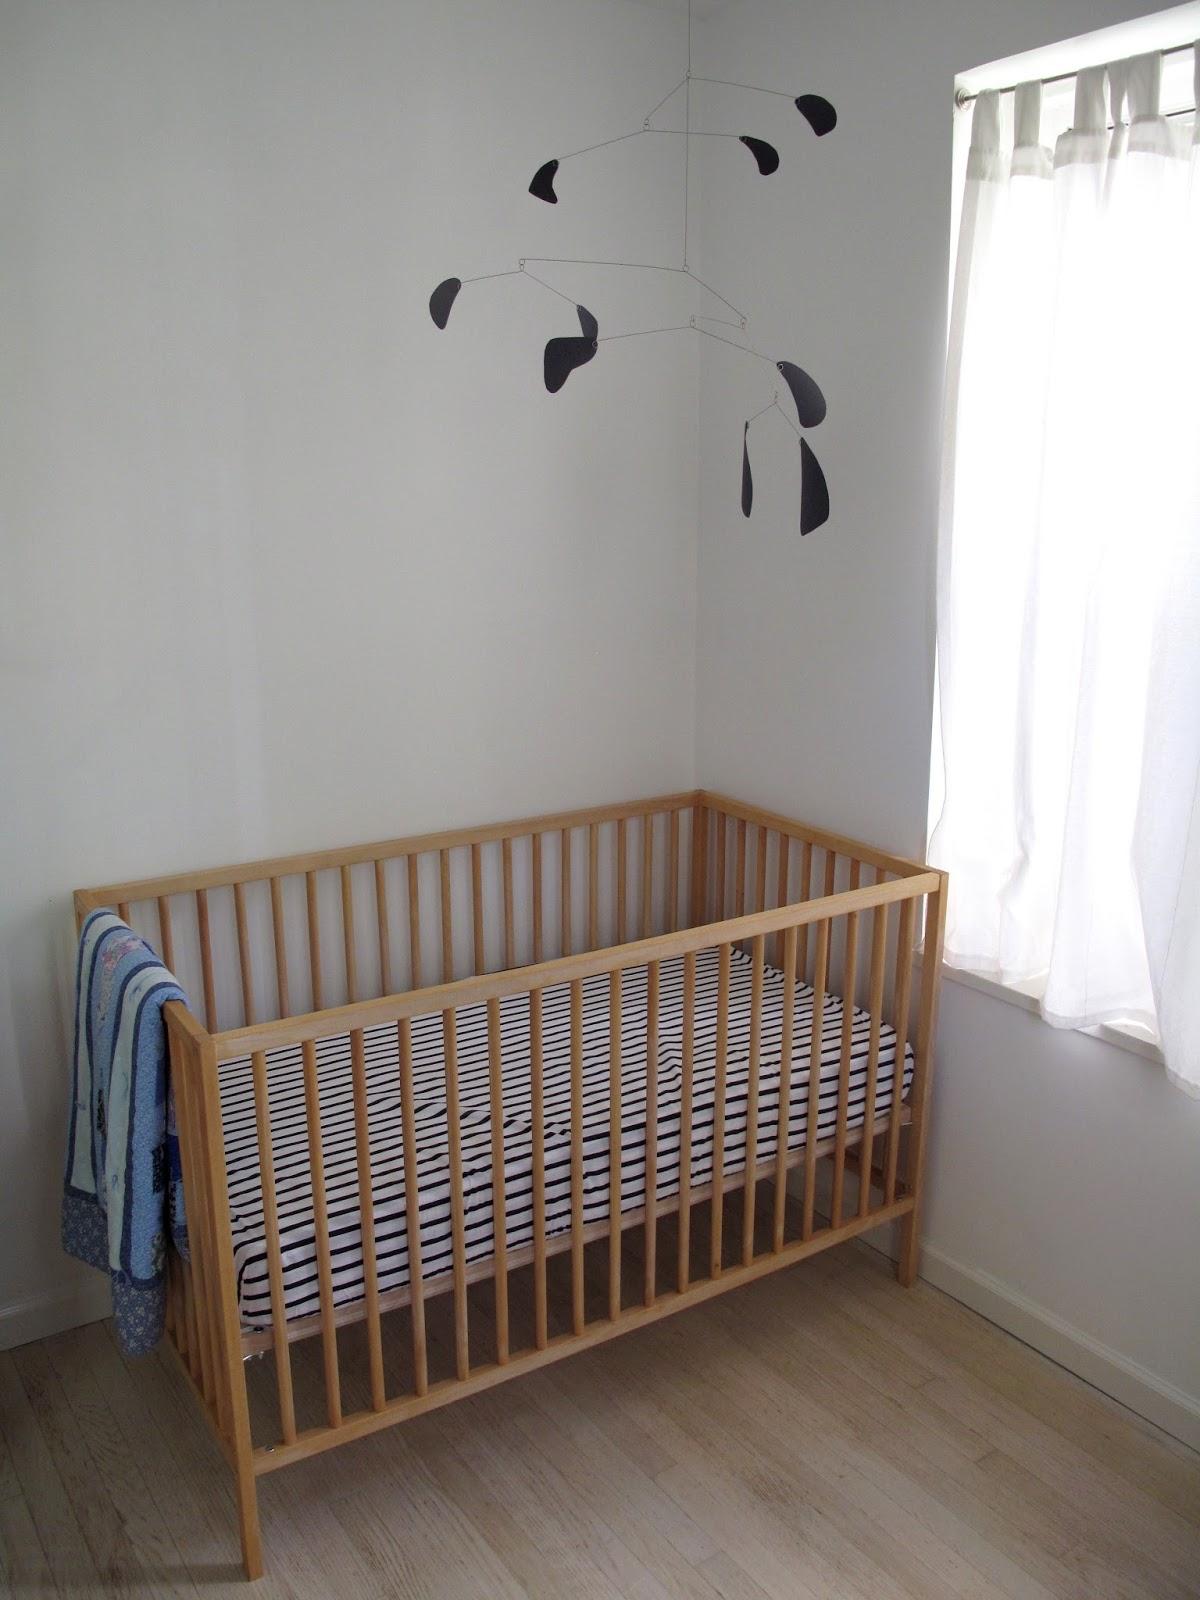 The Little House In The City Ikea Sniglar Crib